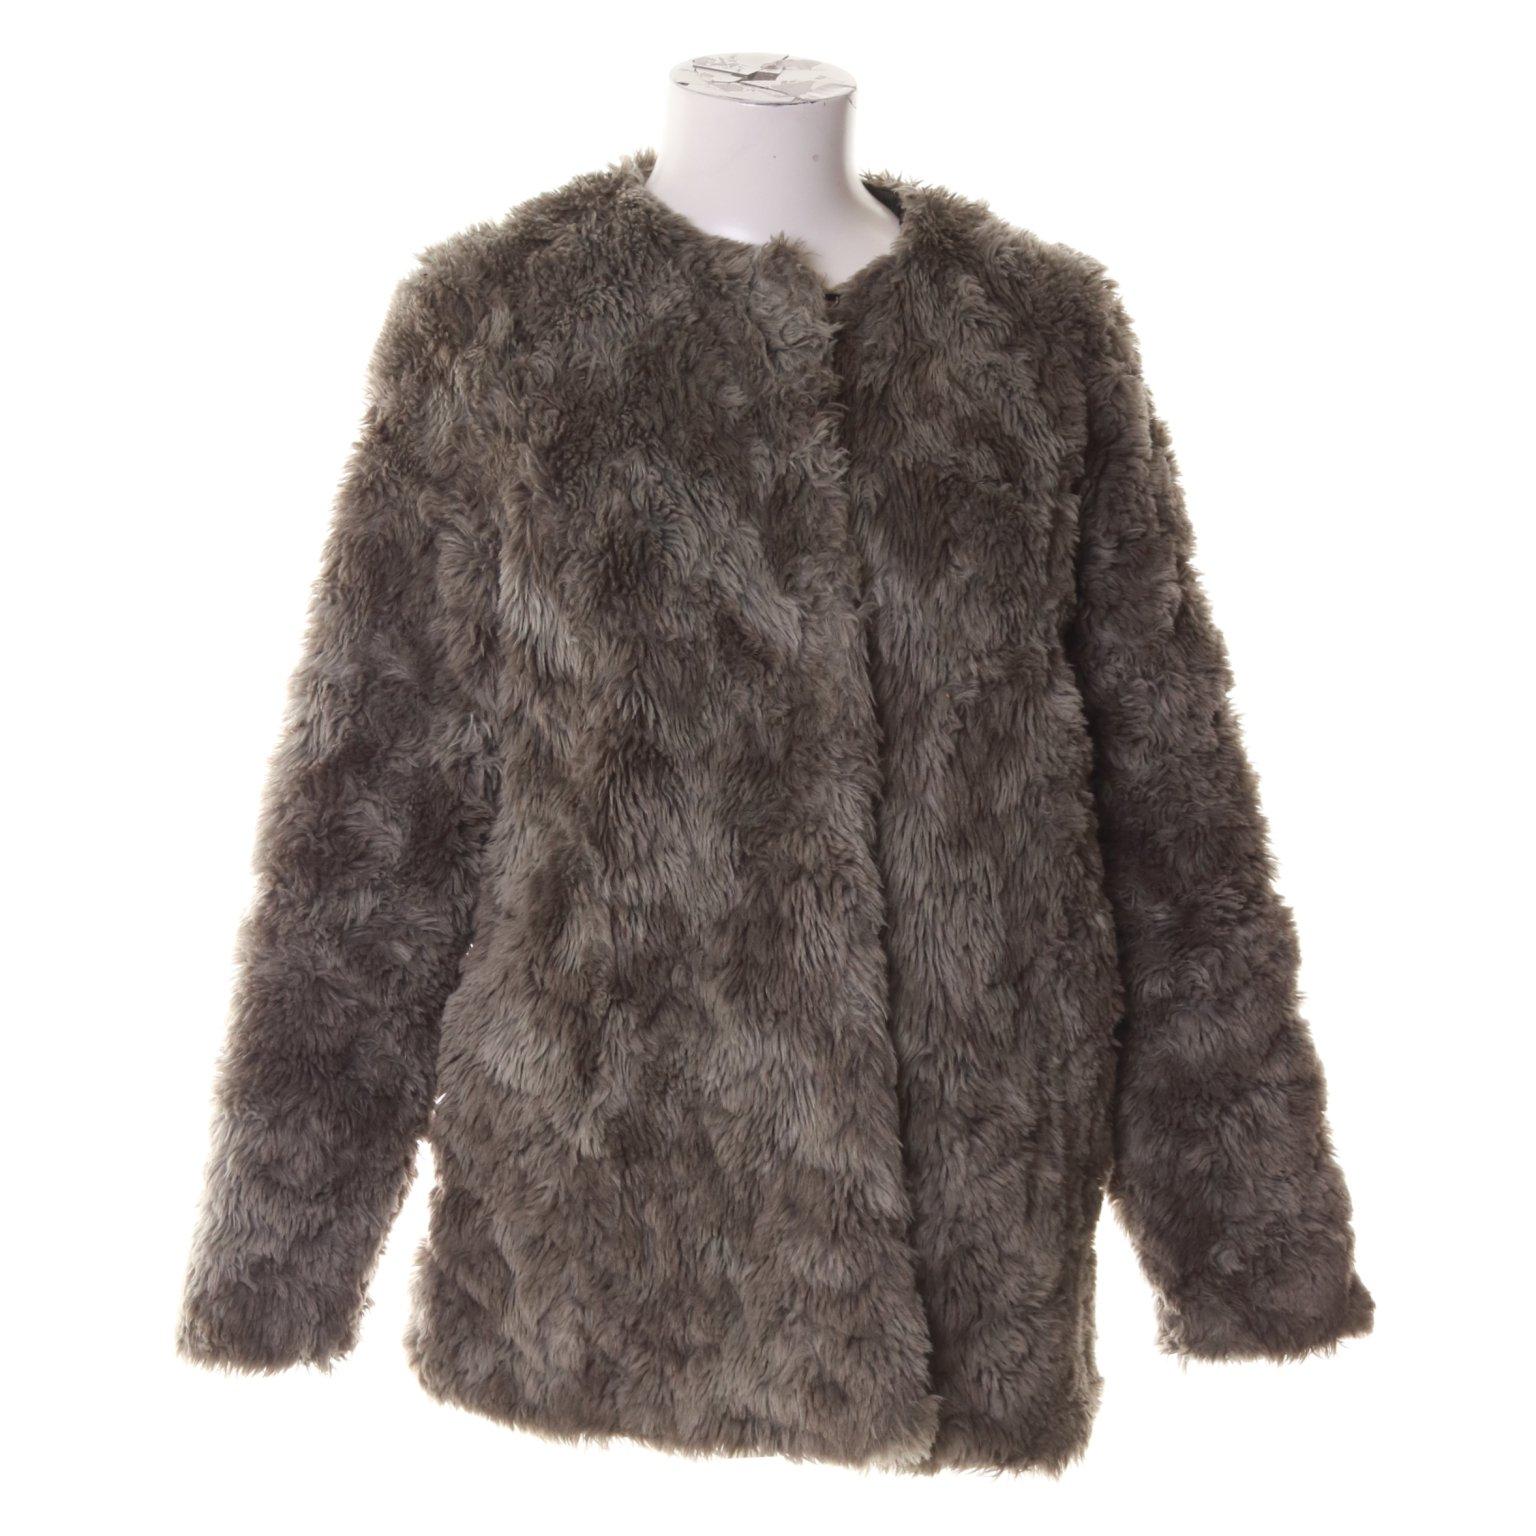 H&M, Jacka, Strl: 38, Faux Fur Päls Teddy, Grå